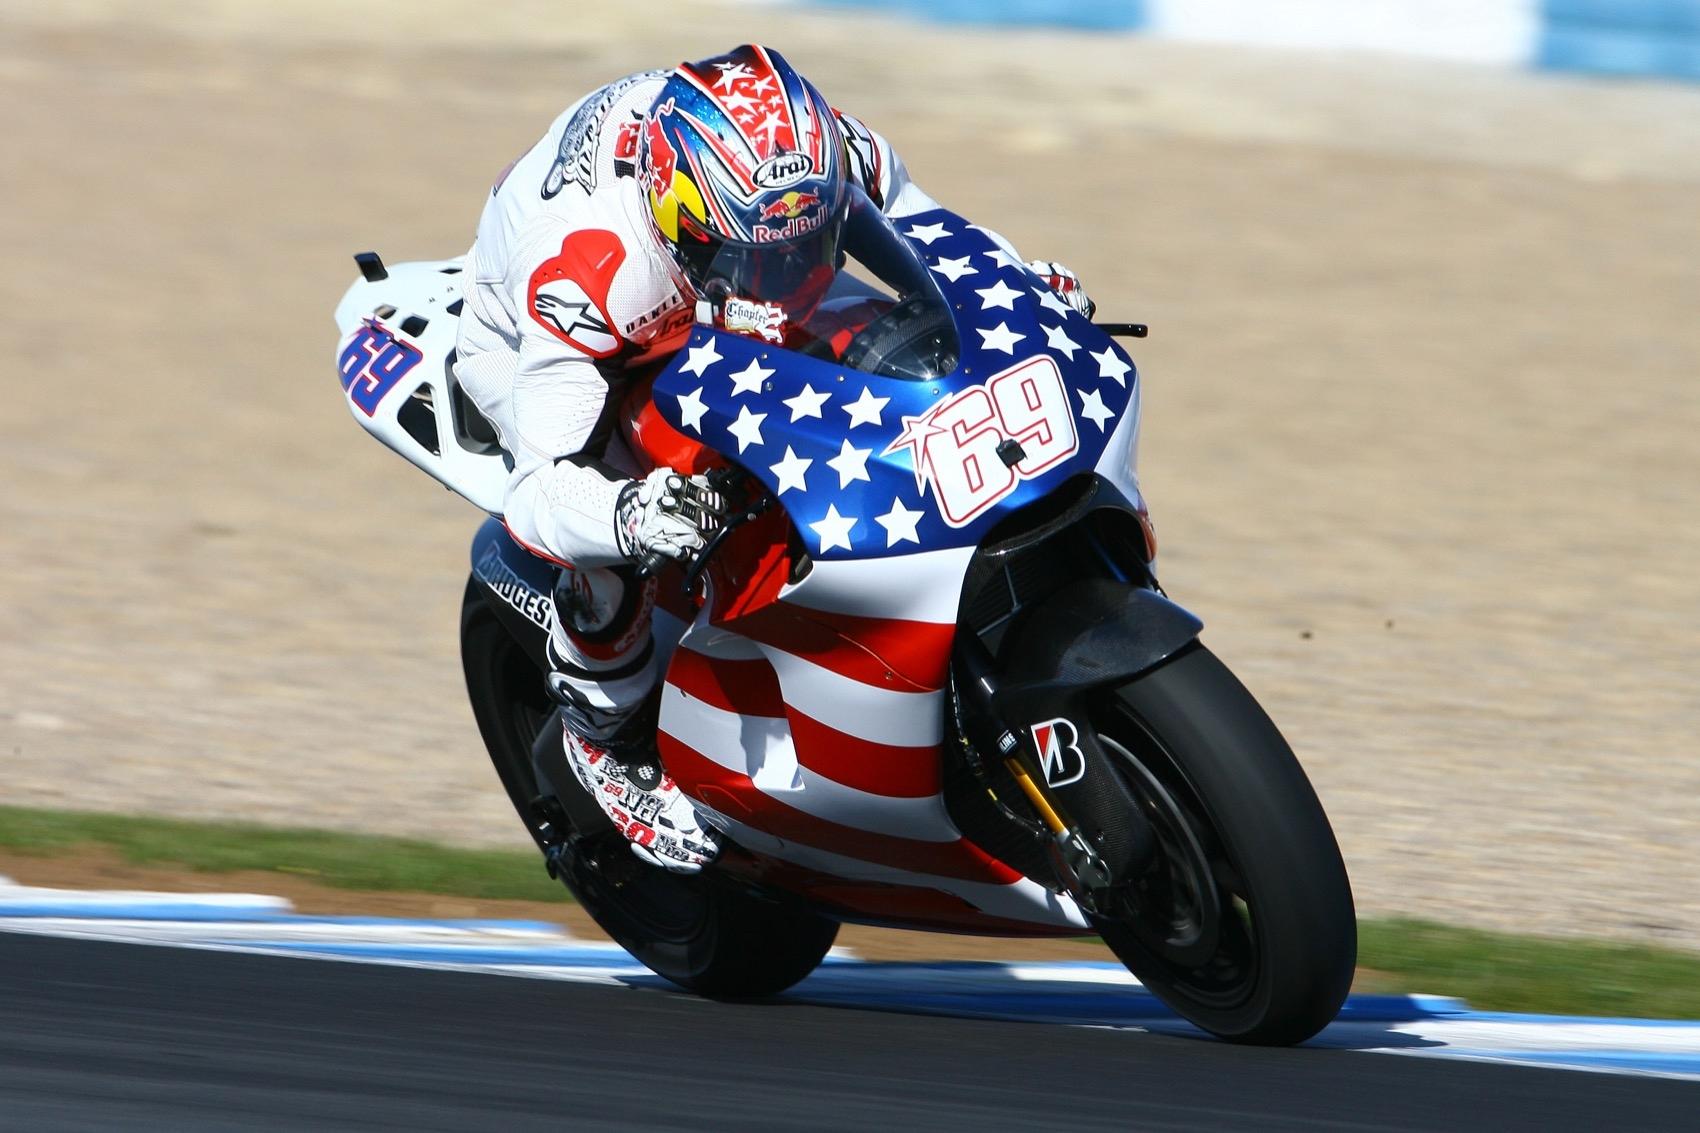 MotoGP decide retirar el 69 de Nicky Hayden